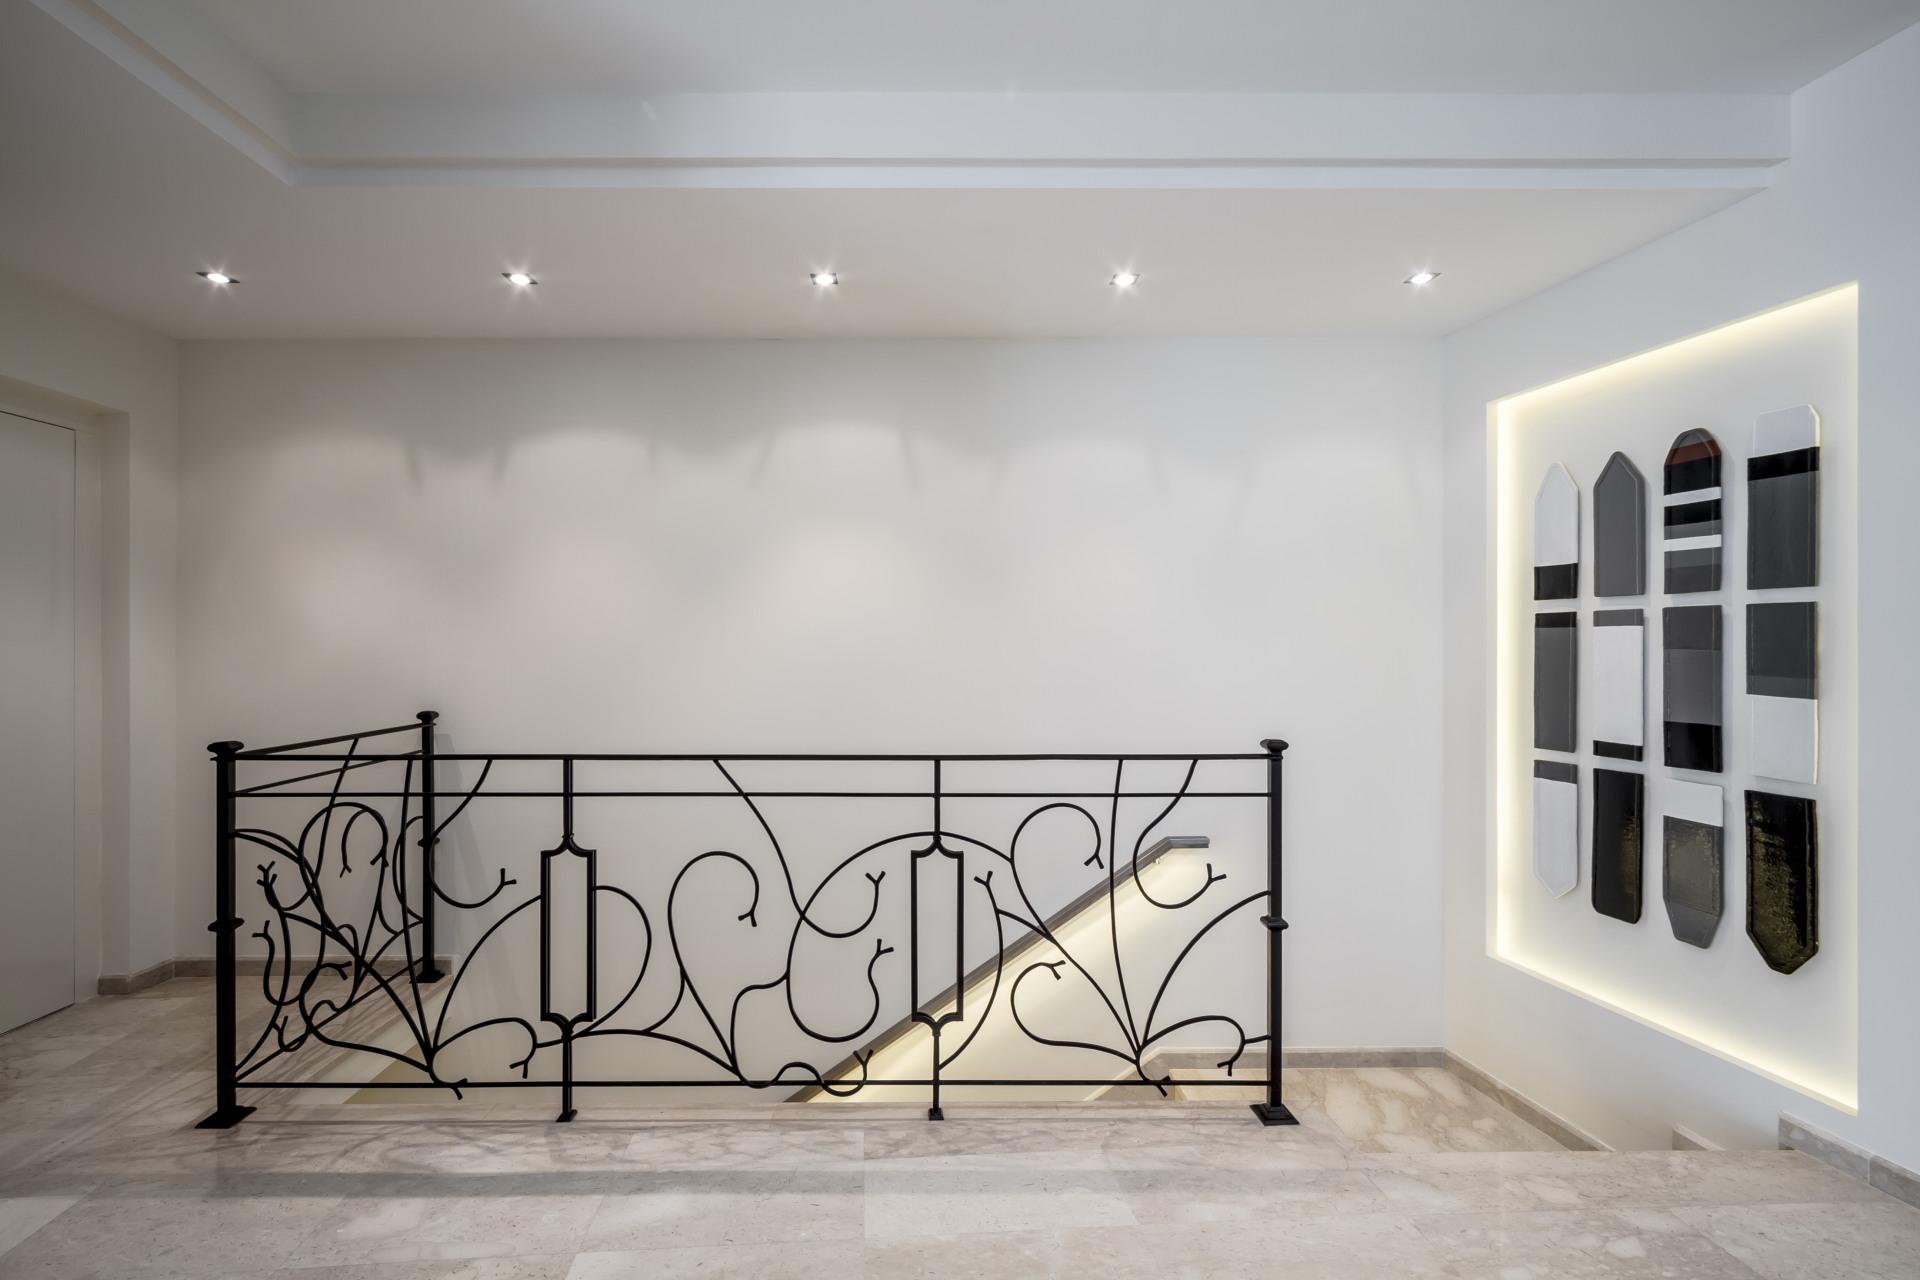 fotografia-arquitectura-interiorismo-valencia-german-cabo-daniela-beaini-alcacer (5)